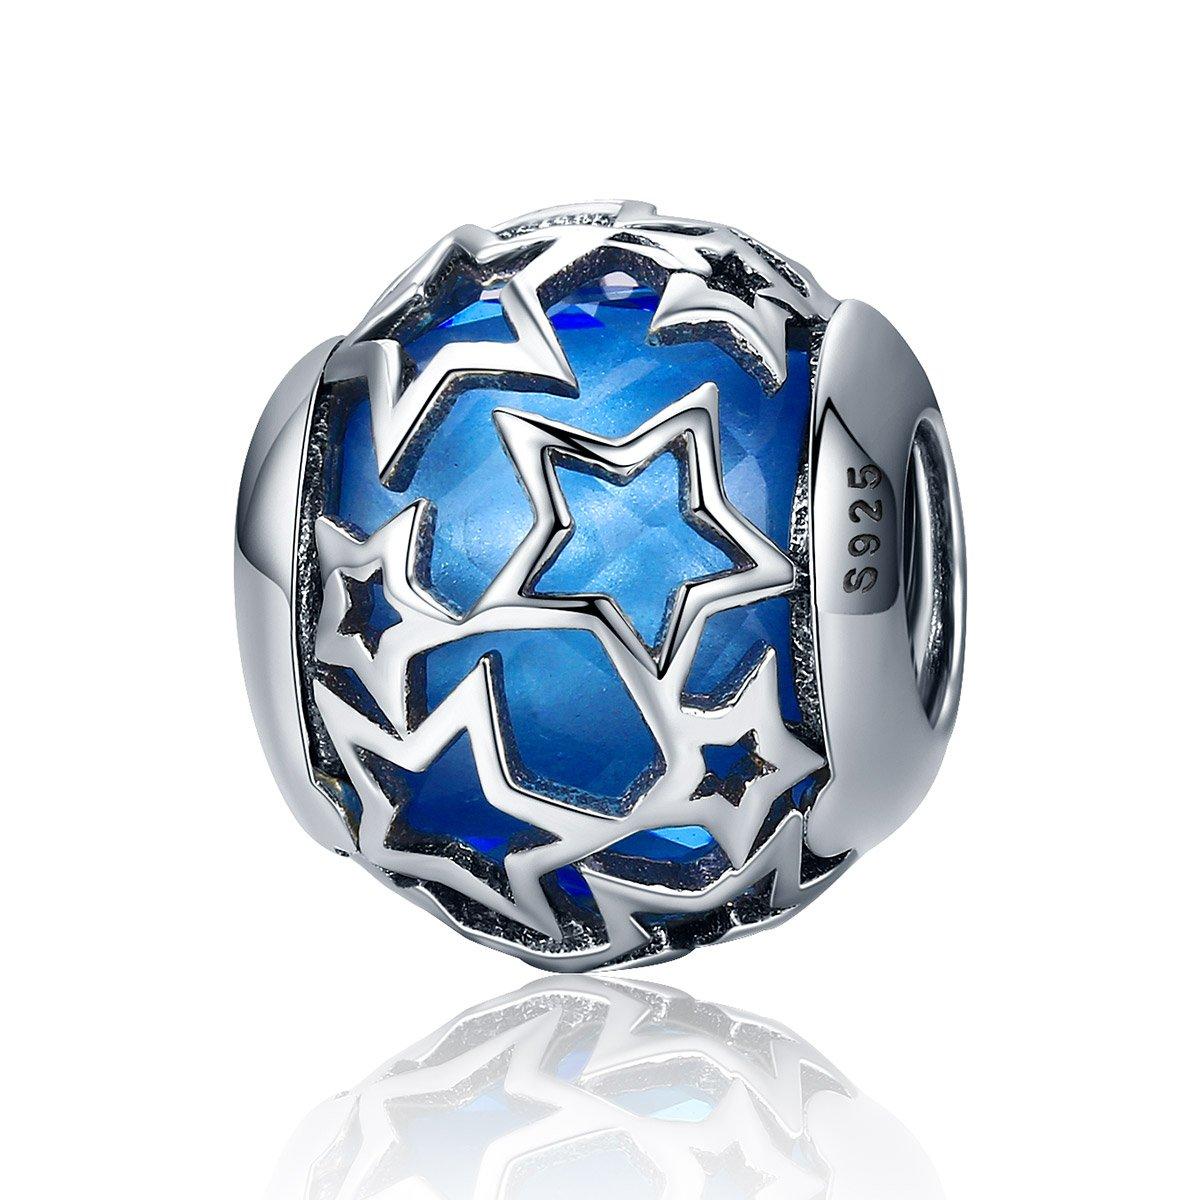 Everbling Shimmering Star Crystal 925 Sterling Silver Bead For European Charm Bracelet (Blue)